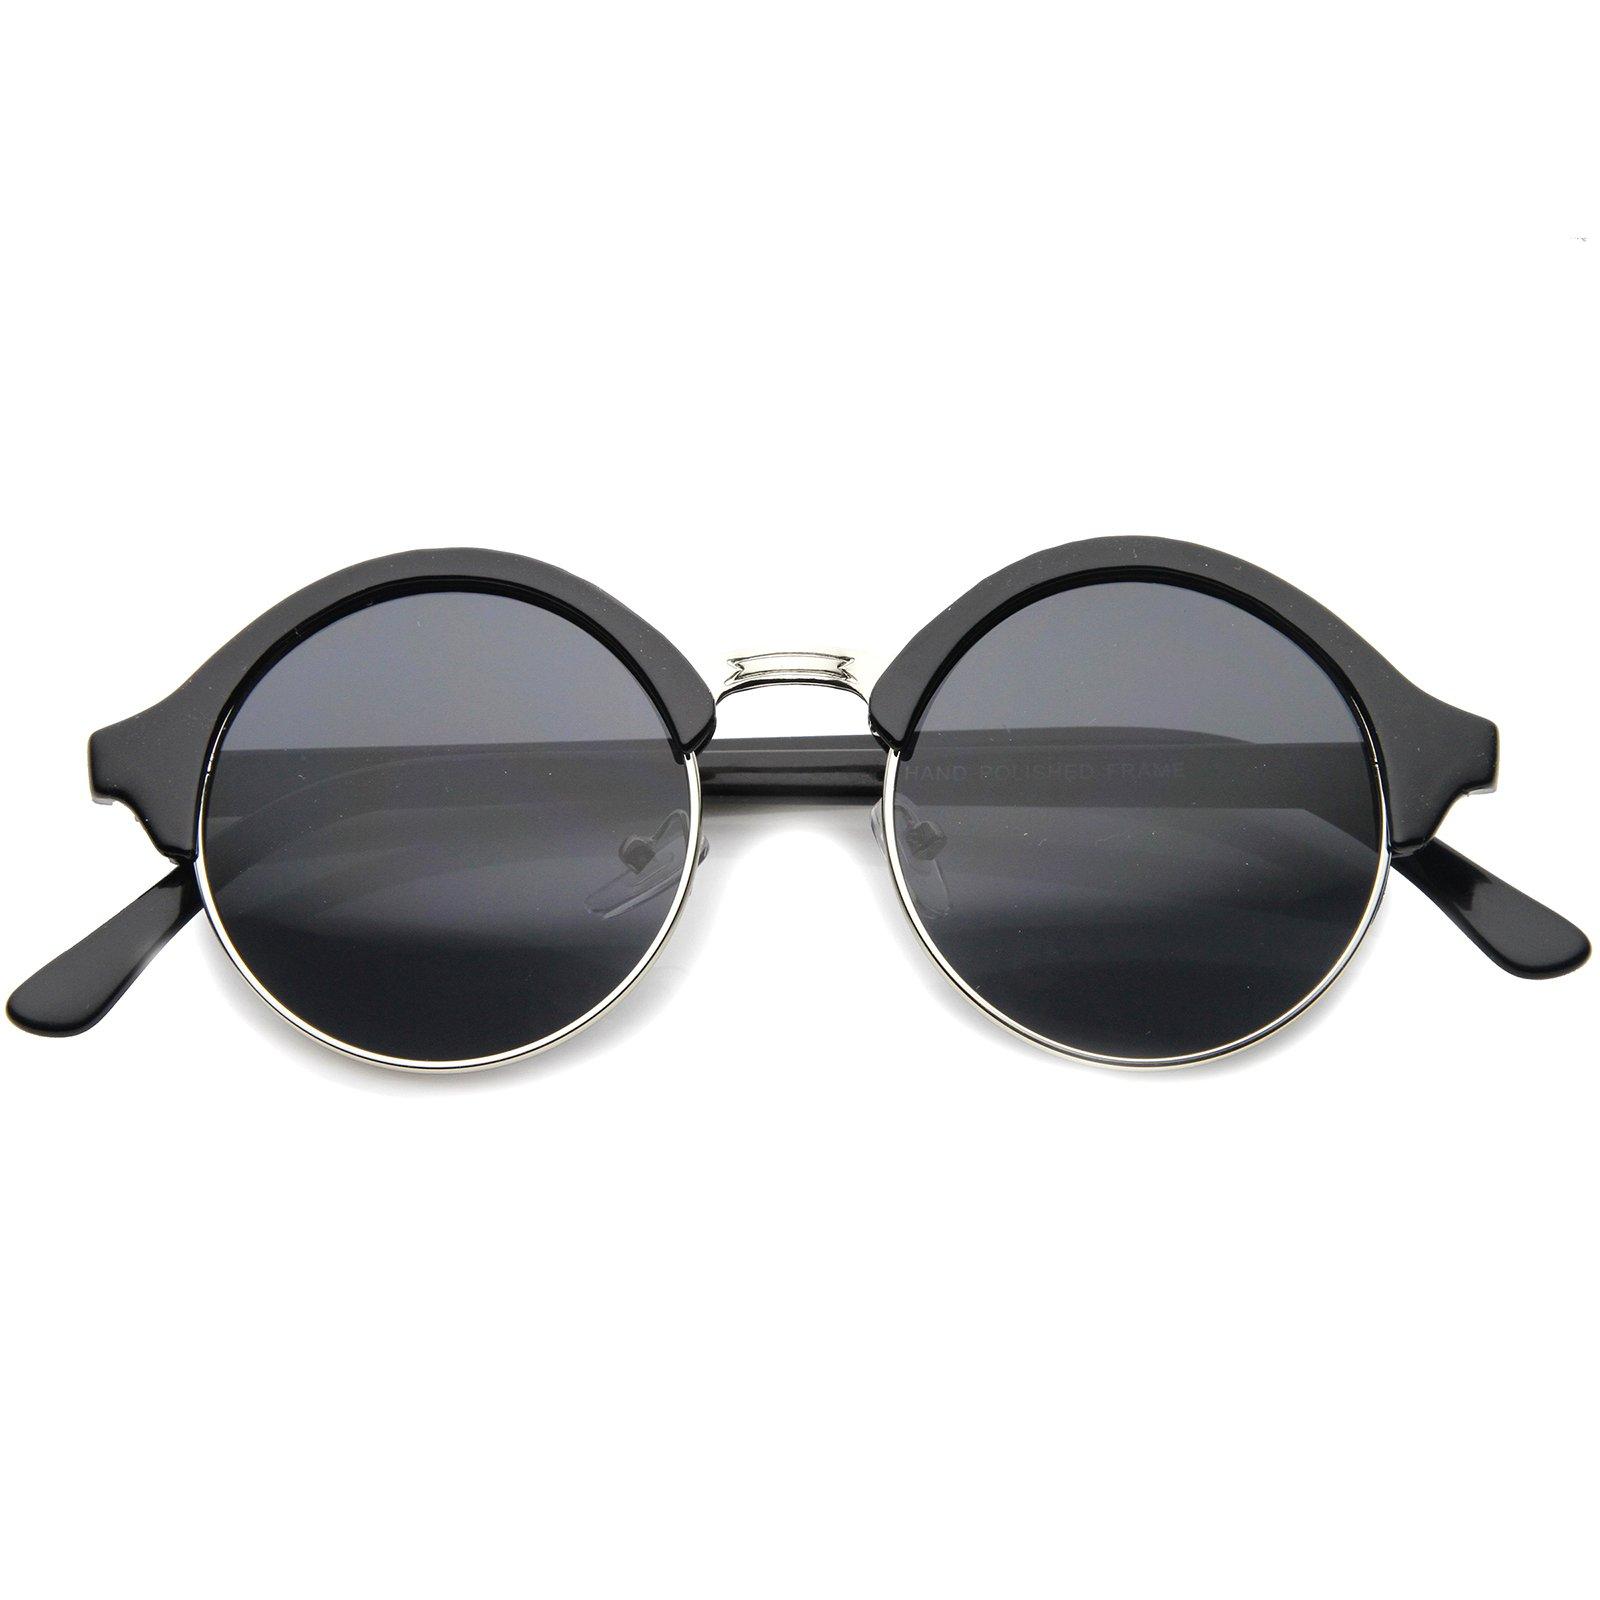 241059b09d Galleon - ZeroUV - Vintage Inspired Classic Half Frame Semi-Rimless Round  Circle Sunglasses (Black-Silver   Smoke)